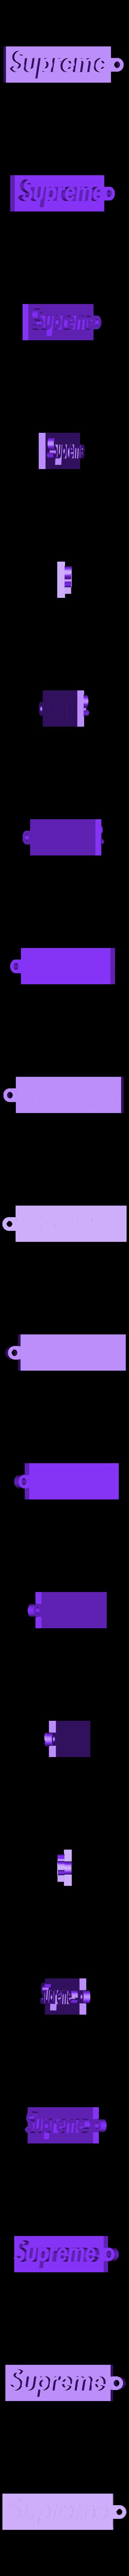 box logo Sup.stl Download free STL file Supreme Key Chain • 3D printer model, HaruNineOne